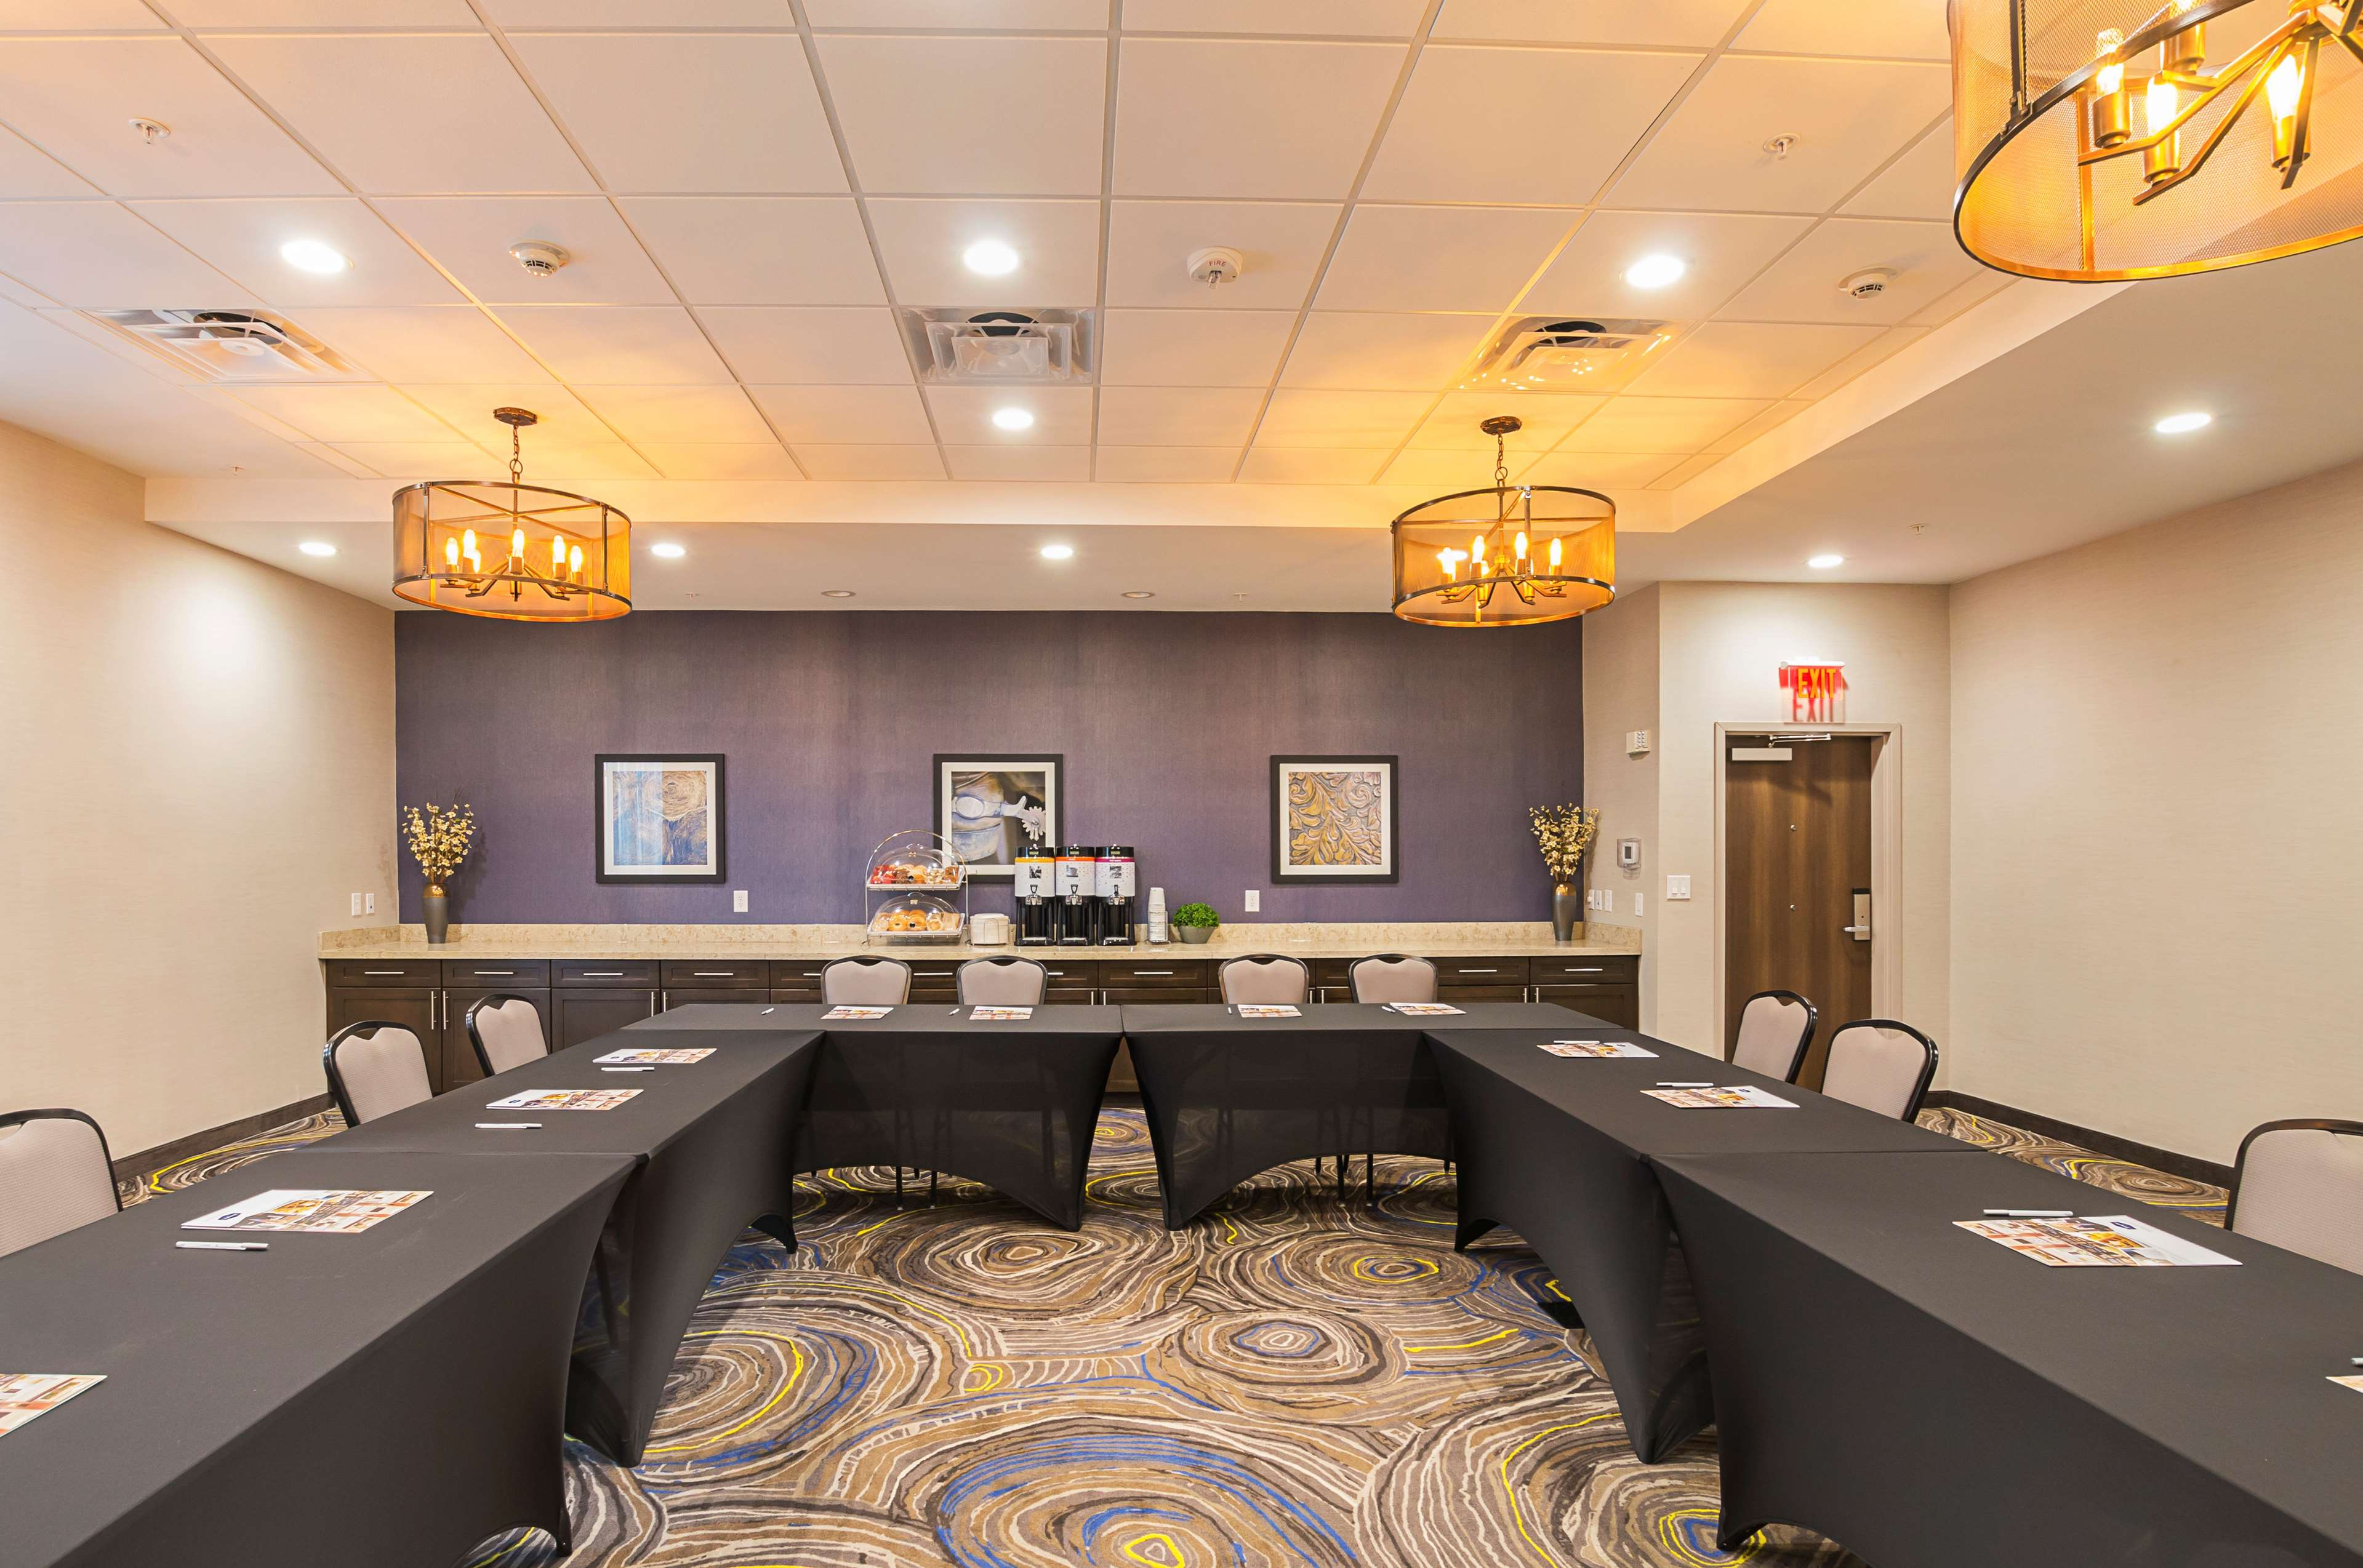 Hampton Inn & Suites Colleyville DFW West image 47